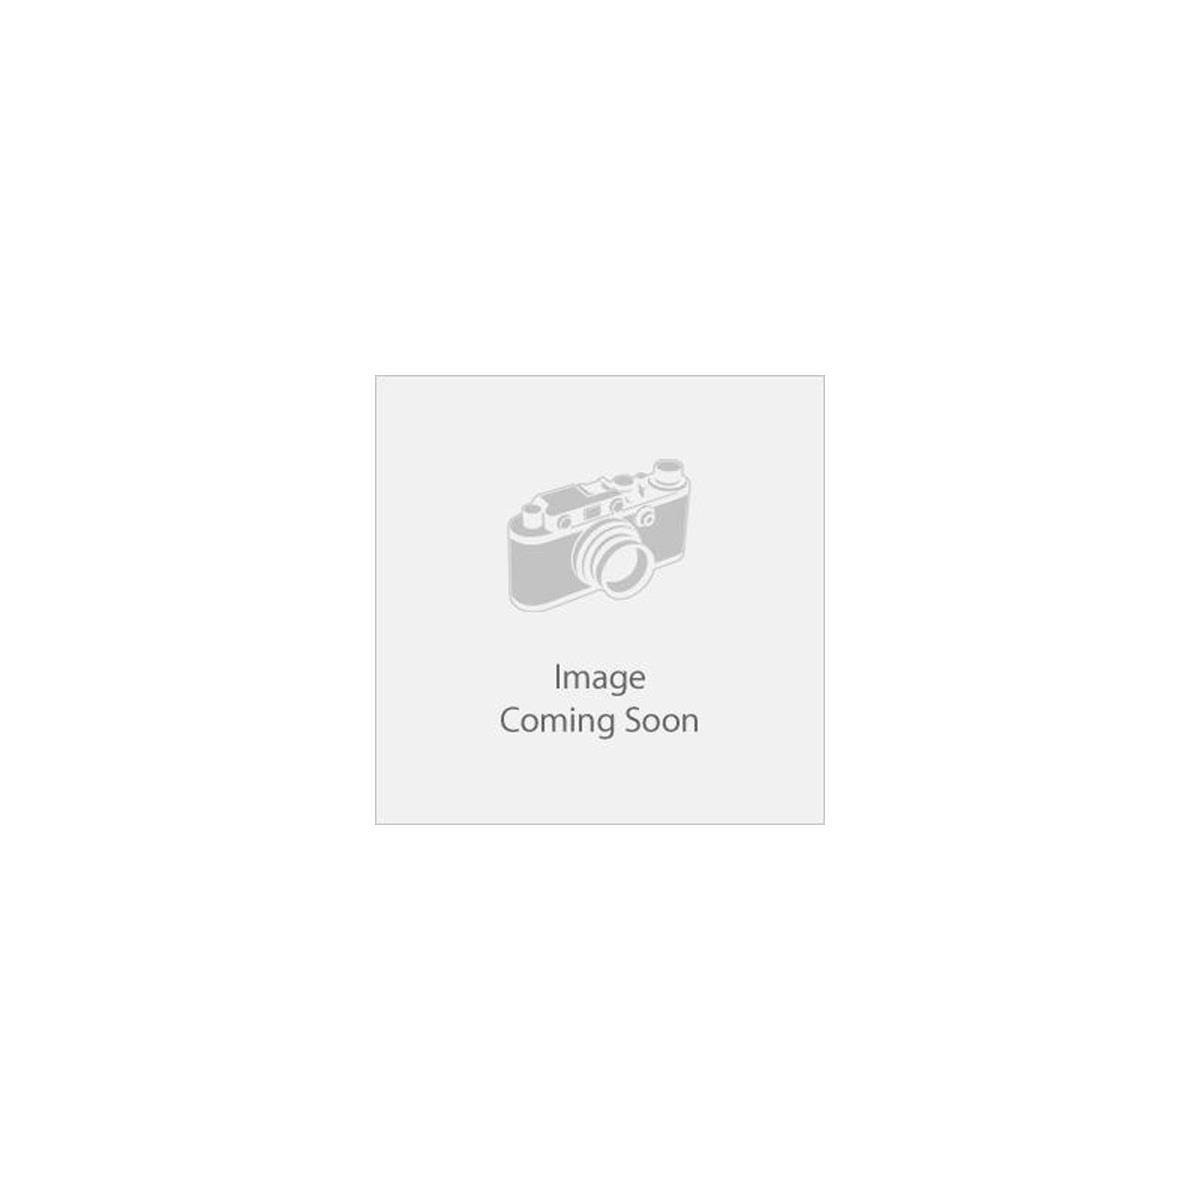 Sony Alpha a6100 Mirrorless Digital Camera Body - With Audio